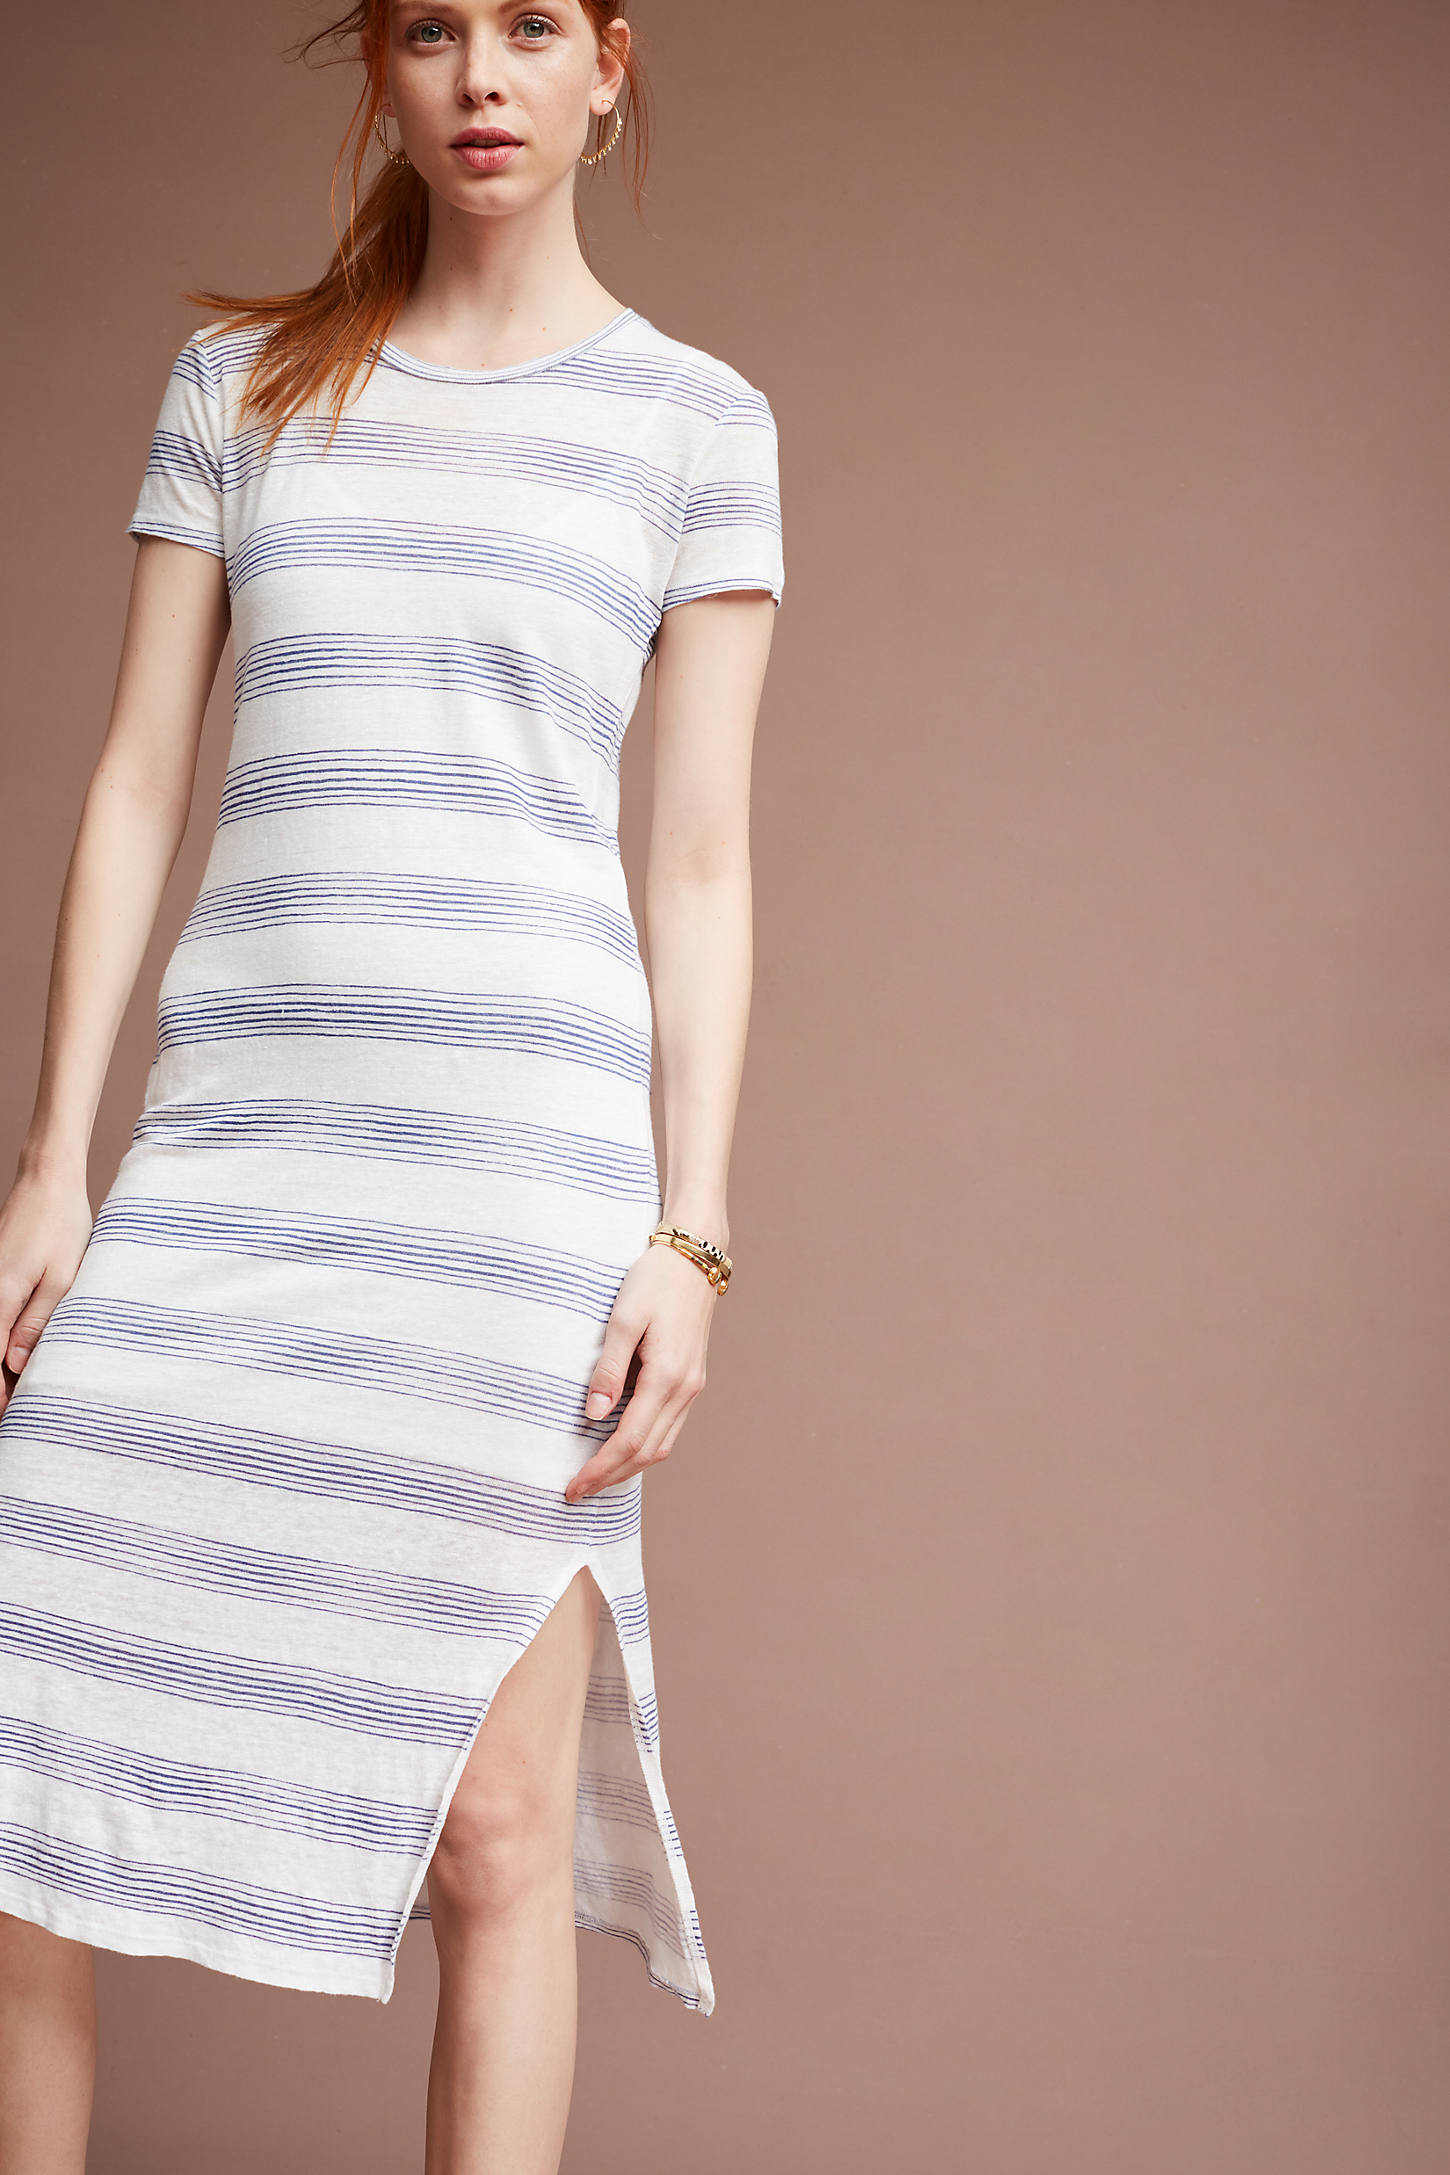 Loganne Striped Dress